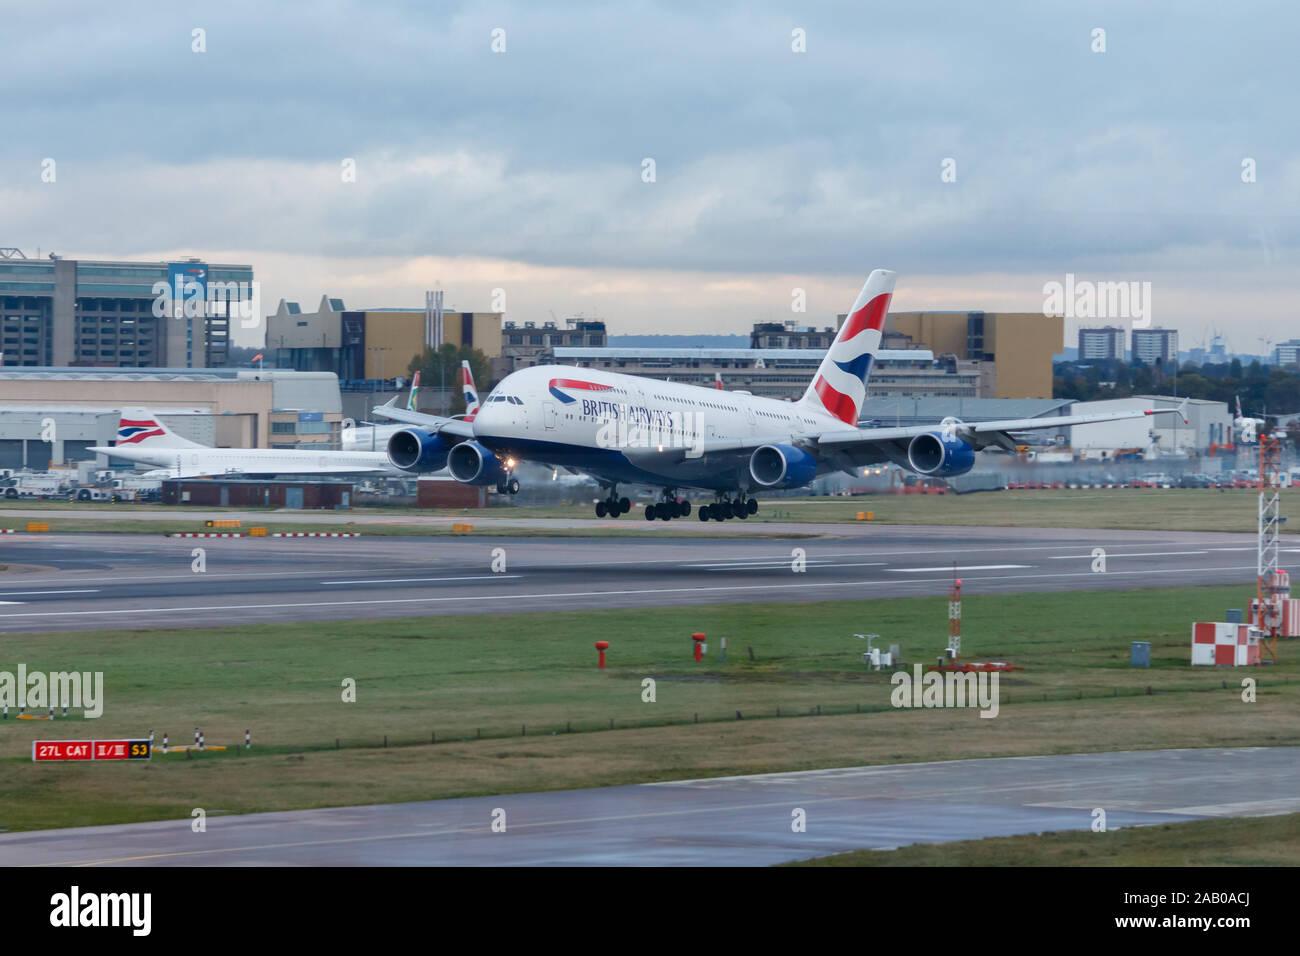 London, England - Circa 2019 : British Airways Airbus A380 Aircraft G-XLEJ Landing at London Heathrow Airport Stock Photo